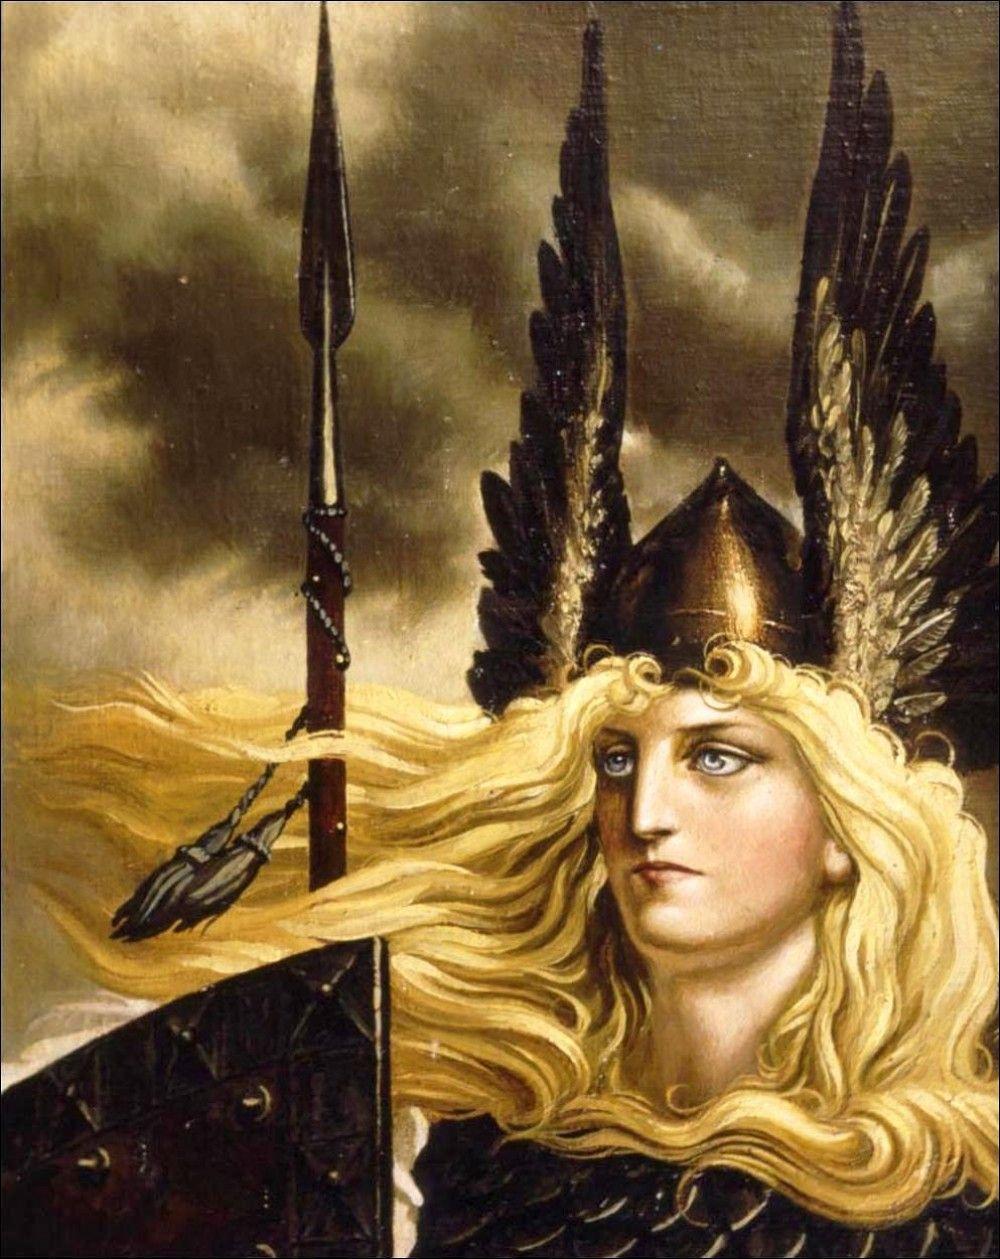 valkyrie an étude 1969 scandinavian mythology empowered